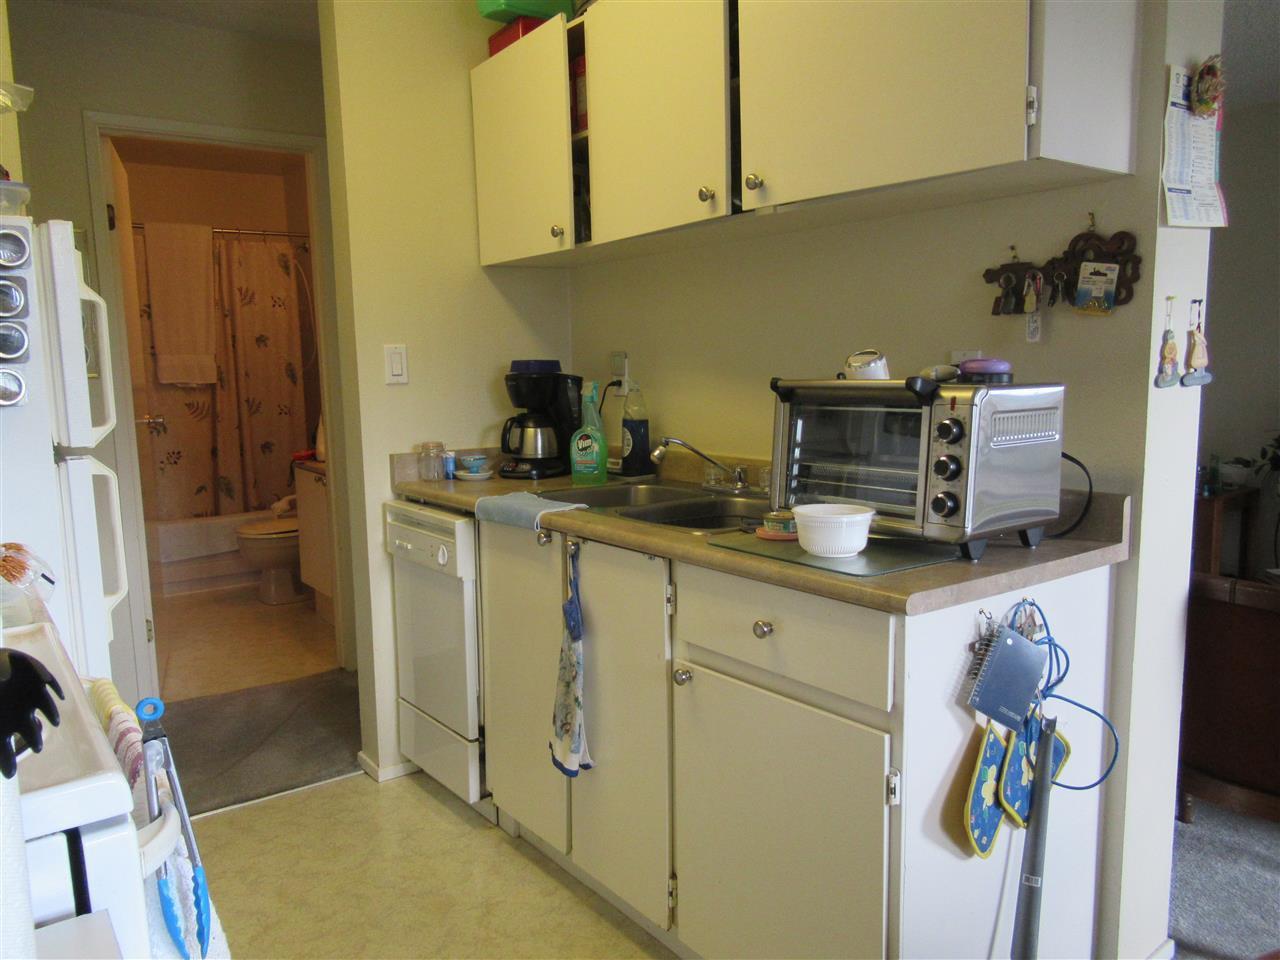 Photo 5: Photos: 101 280 N BROADWAY Avenue in Williams Lake: Williams Lake - City Condo for sale (Williams Lake (Zone 27))  : MLS®# R2382503